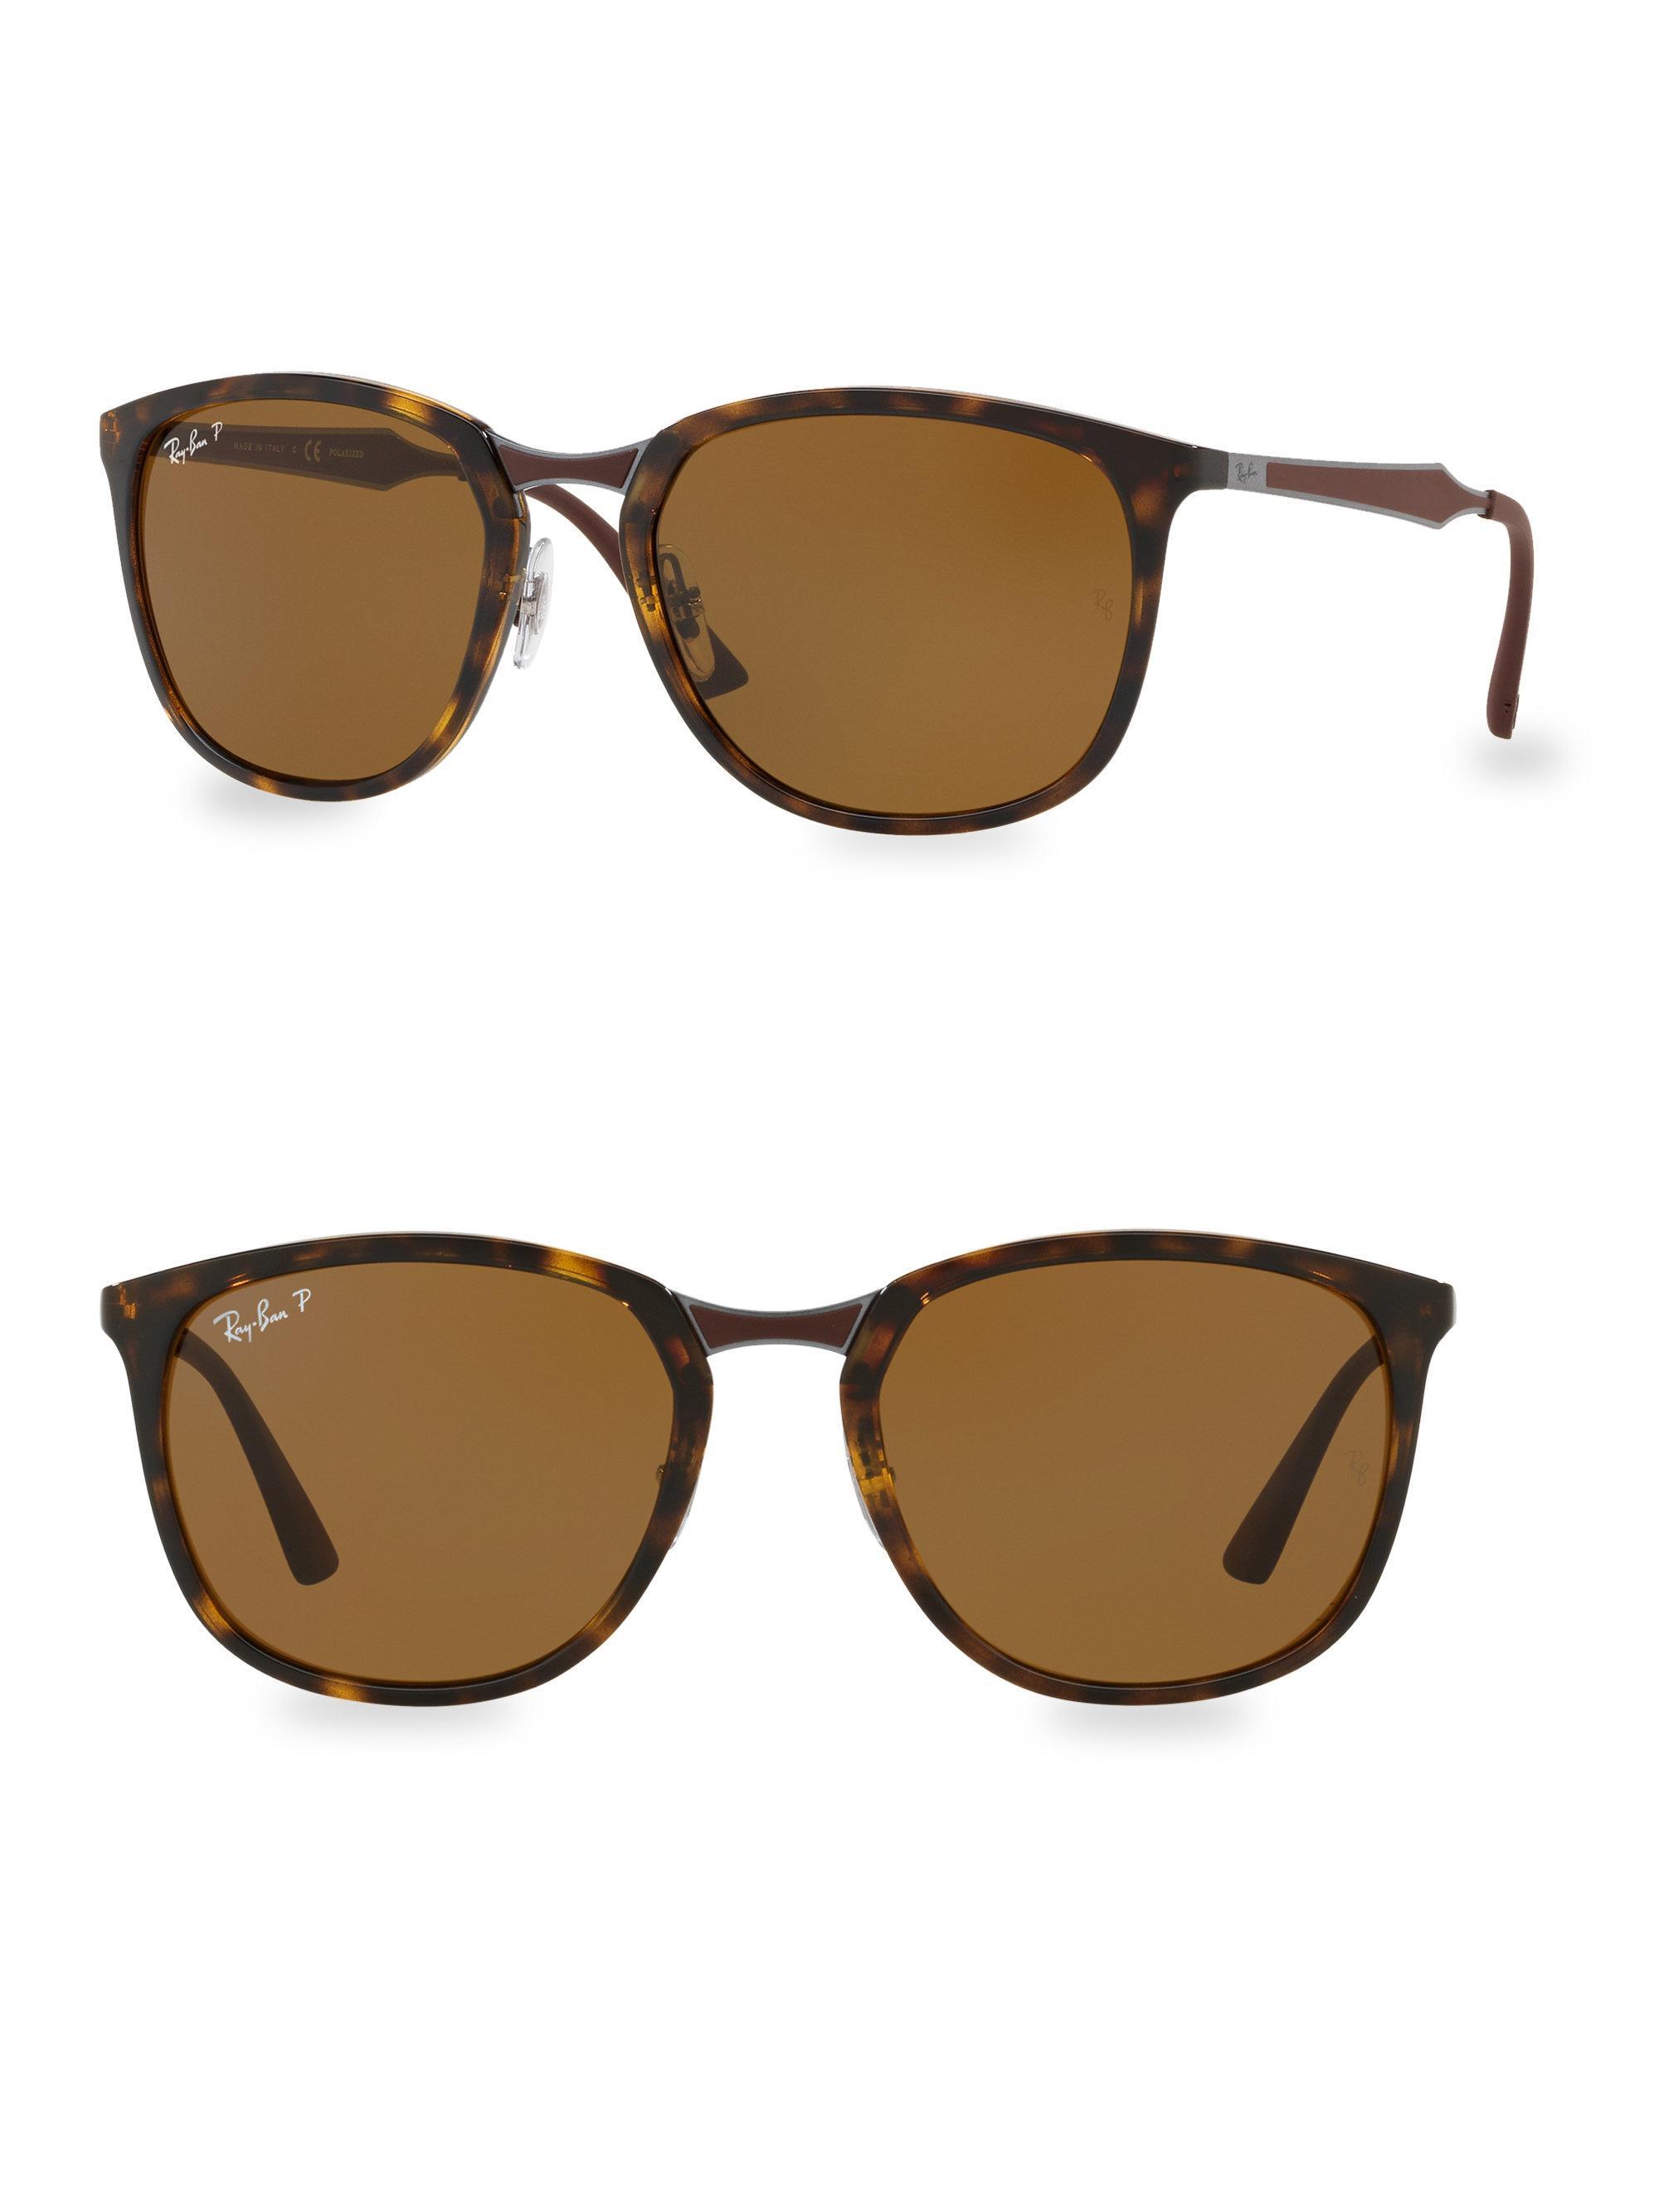 de68b1c855 Lyst - Ray-Ban Round Tortoise Sunglasses in Brown for Men